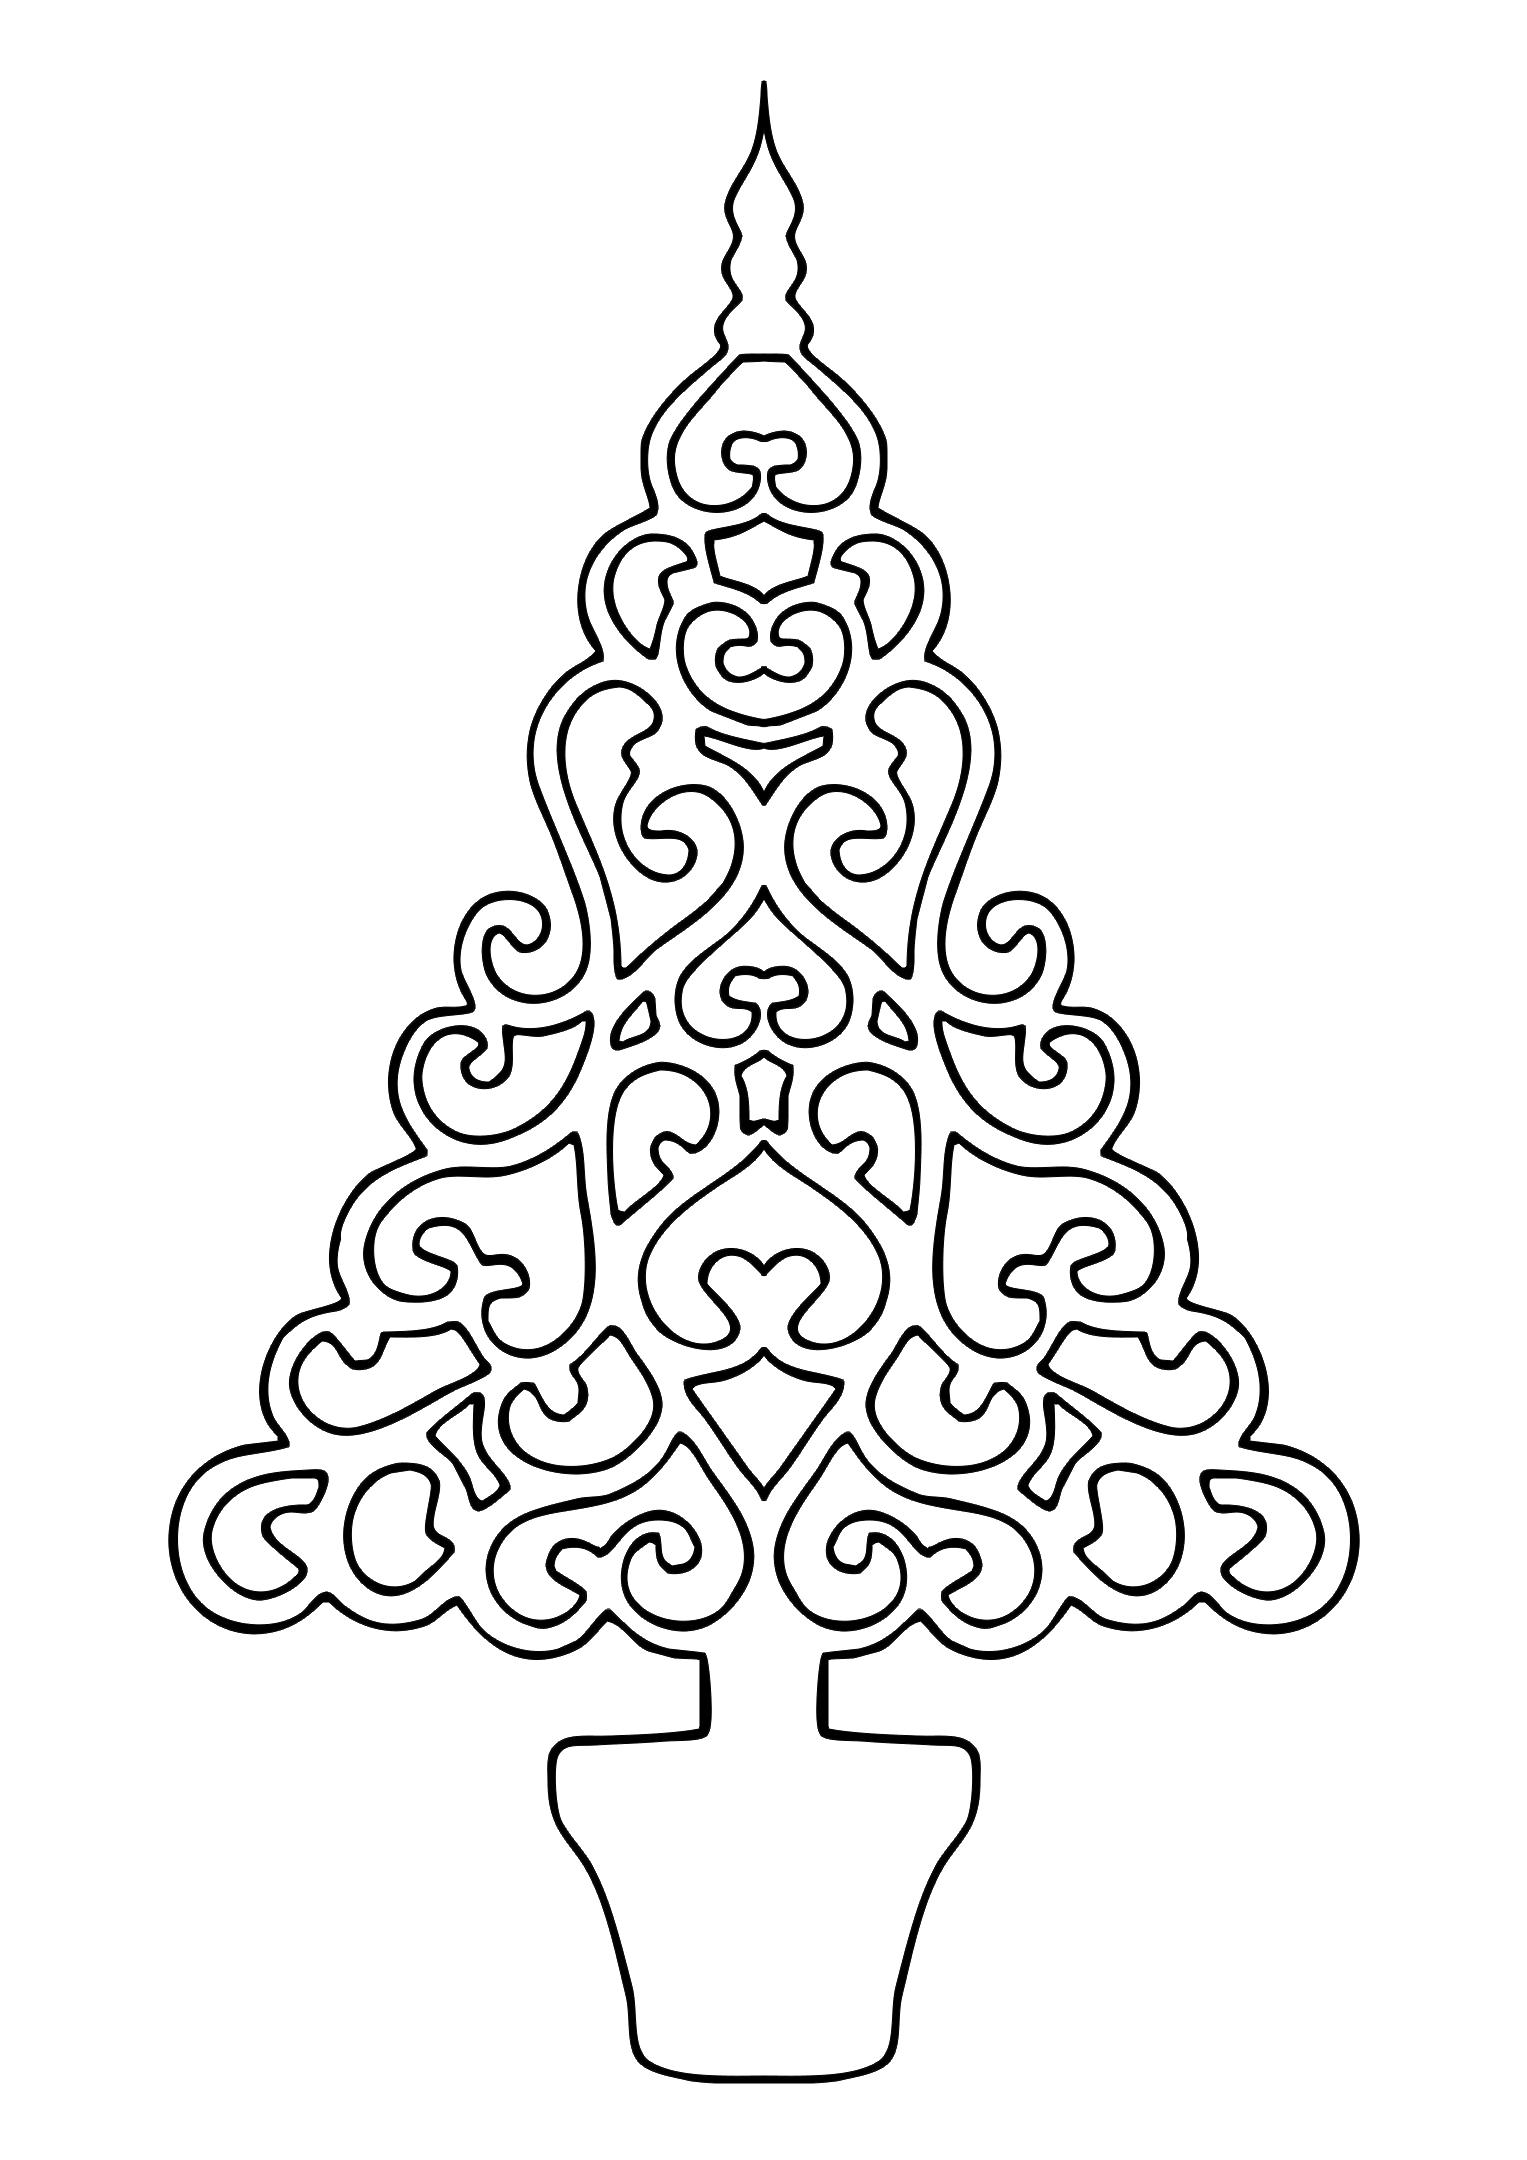 Pin by verébné müller on karácsony pinterest ribbon embroidery